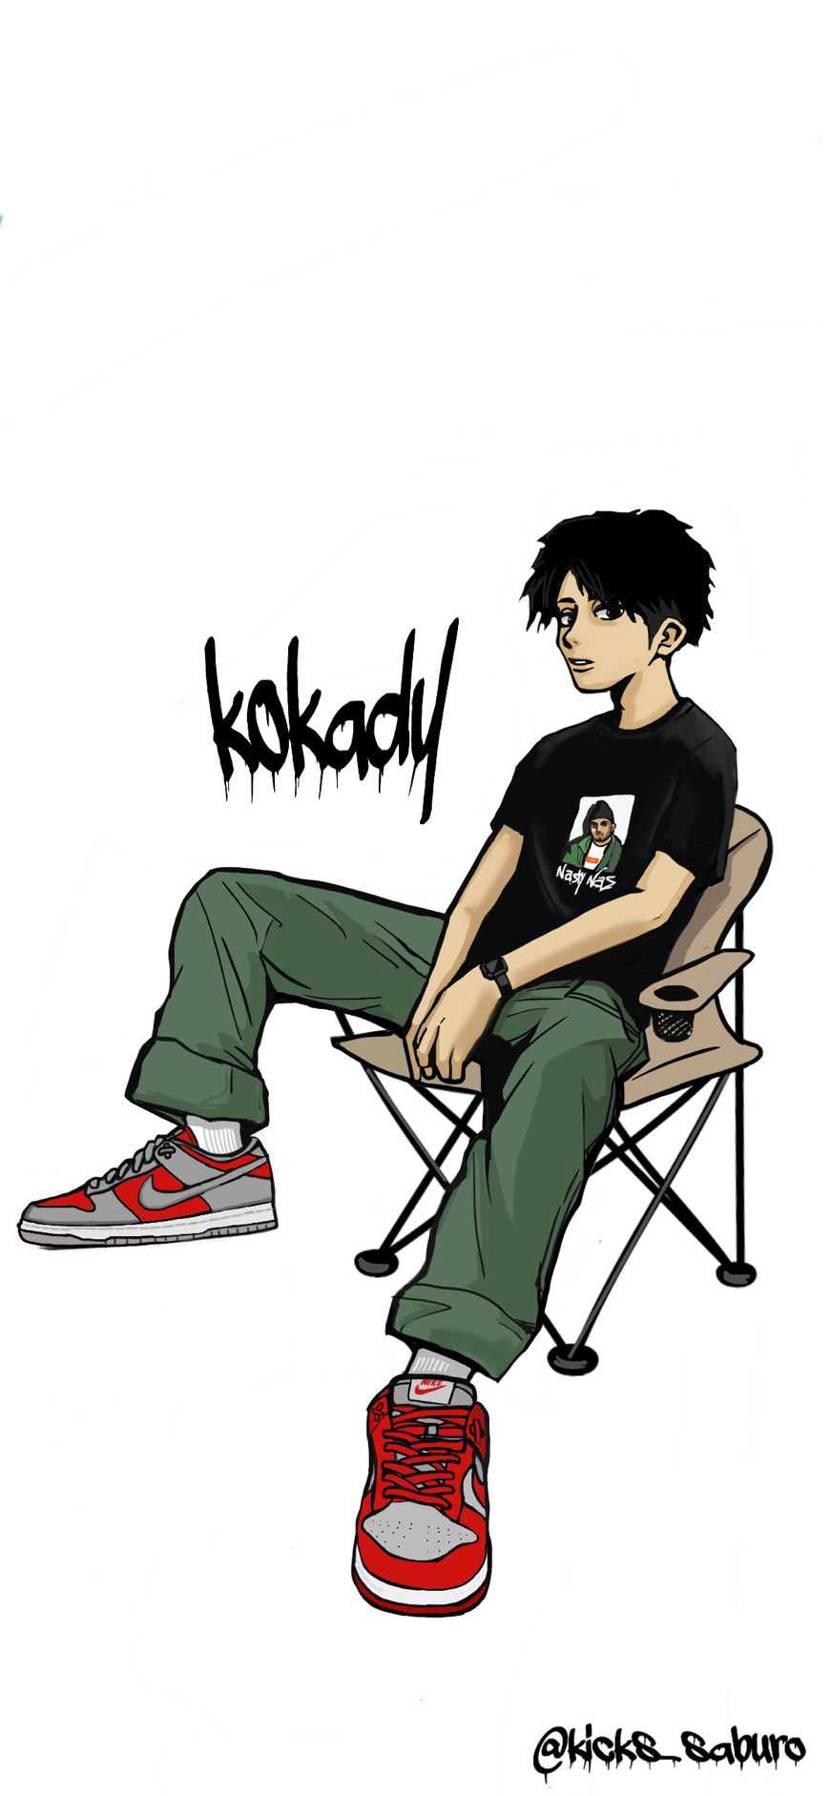 #kicks_saburo 師匠 @kicks_saburo